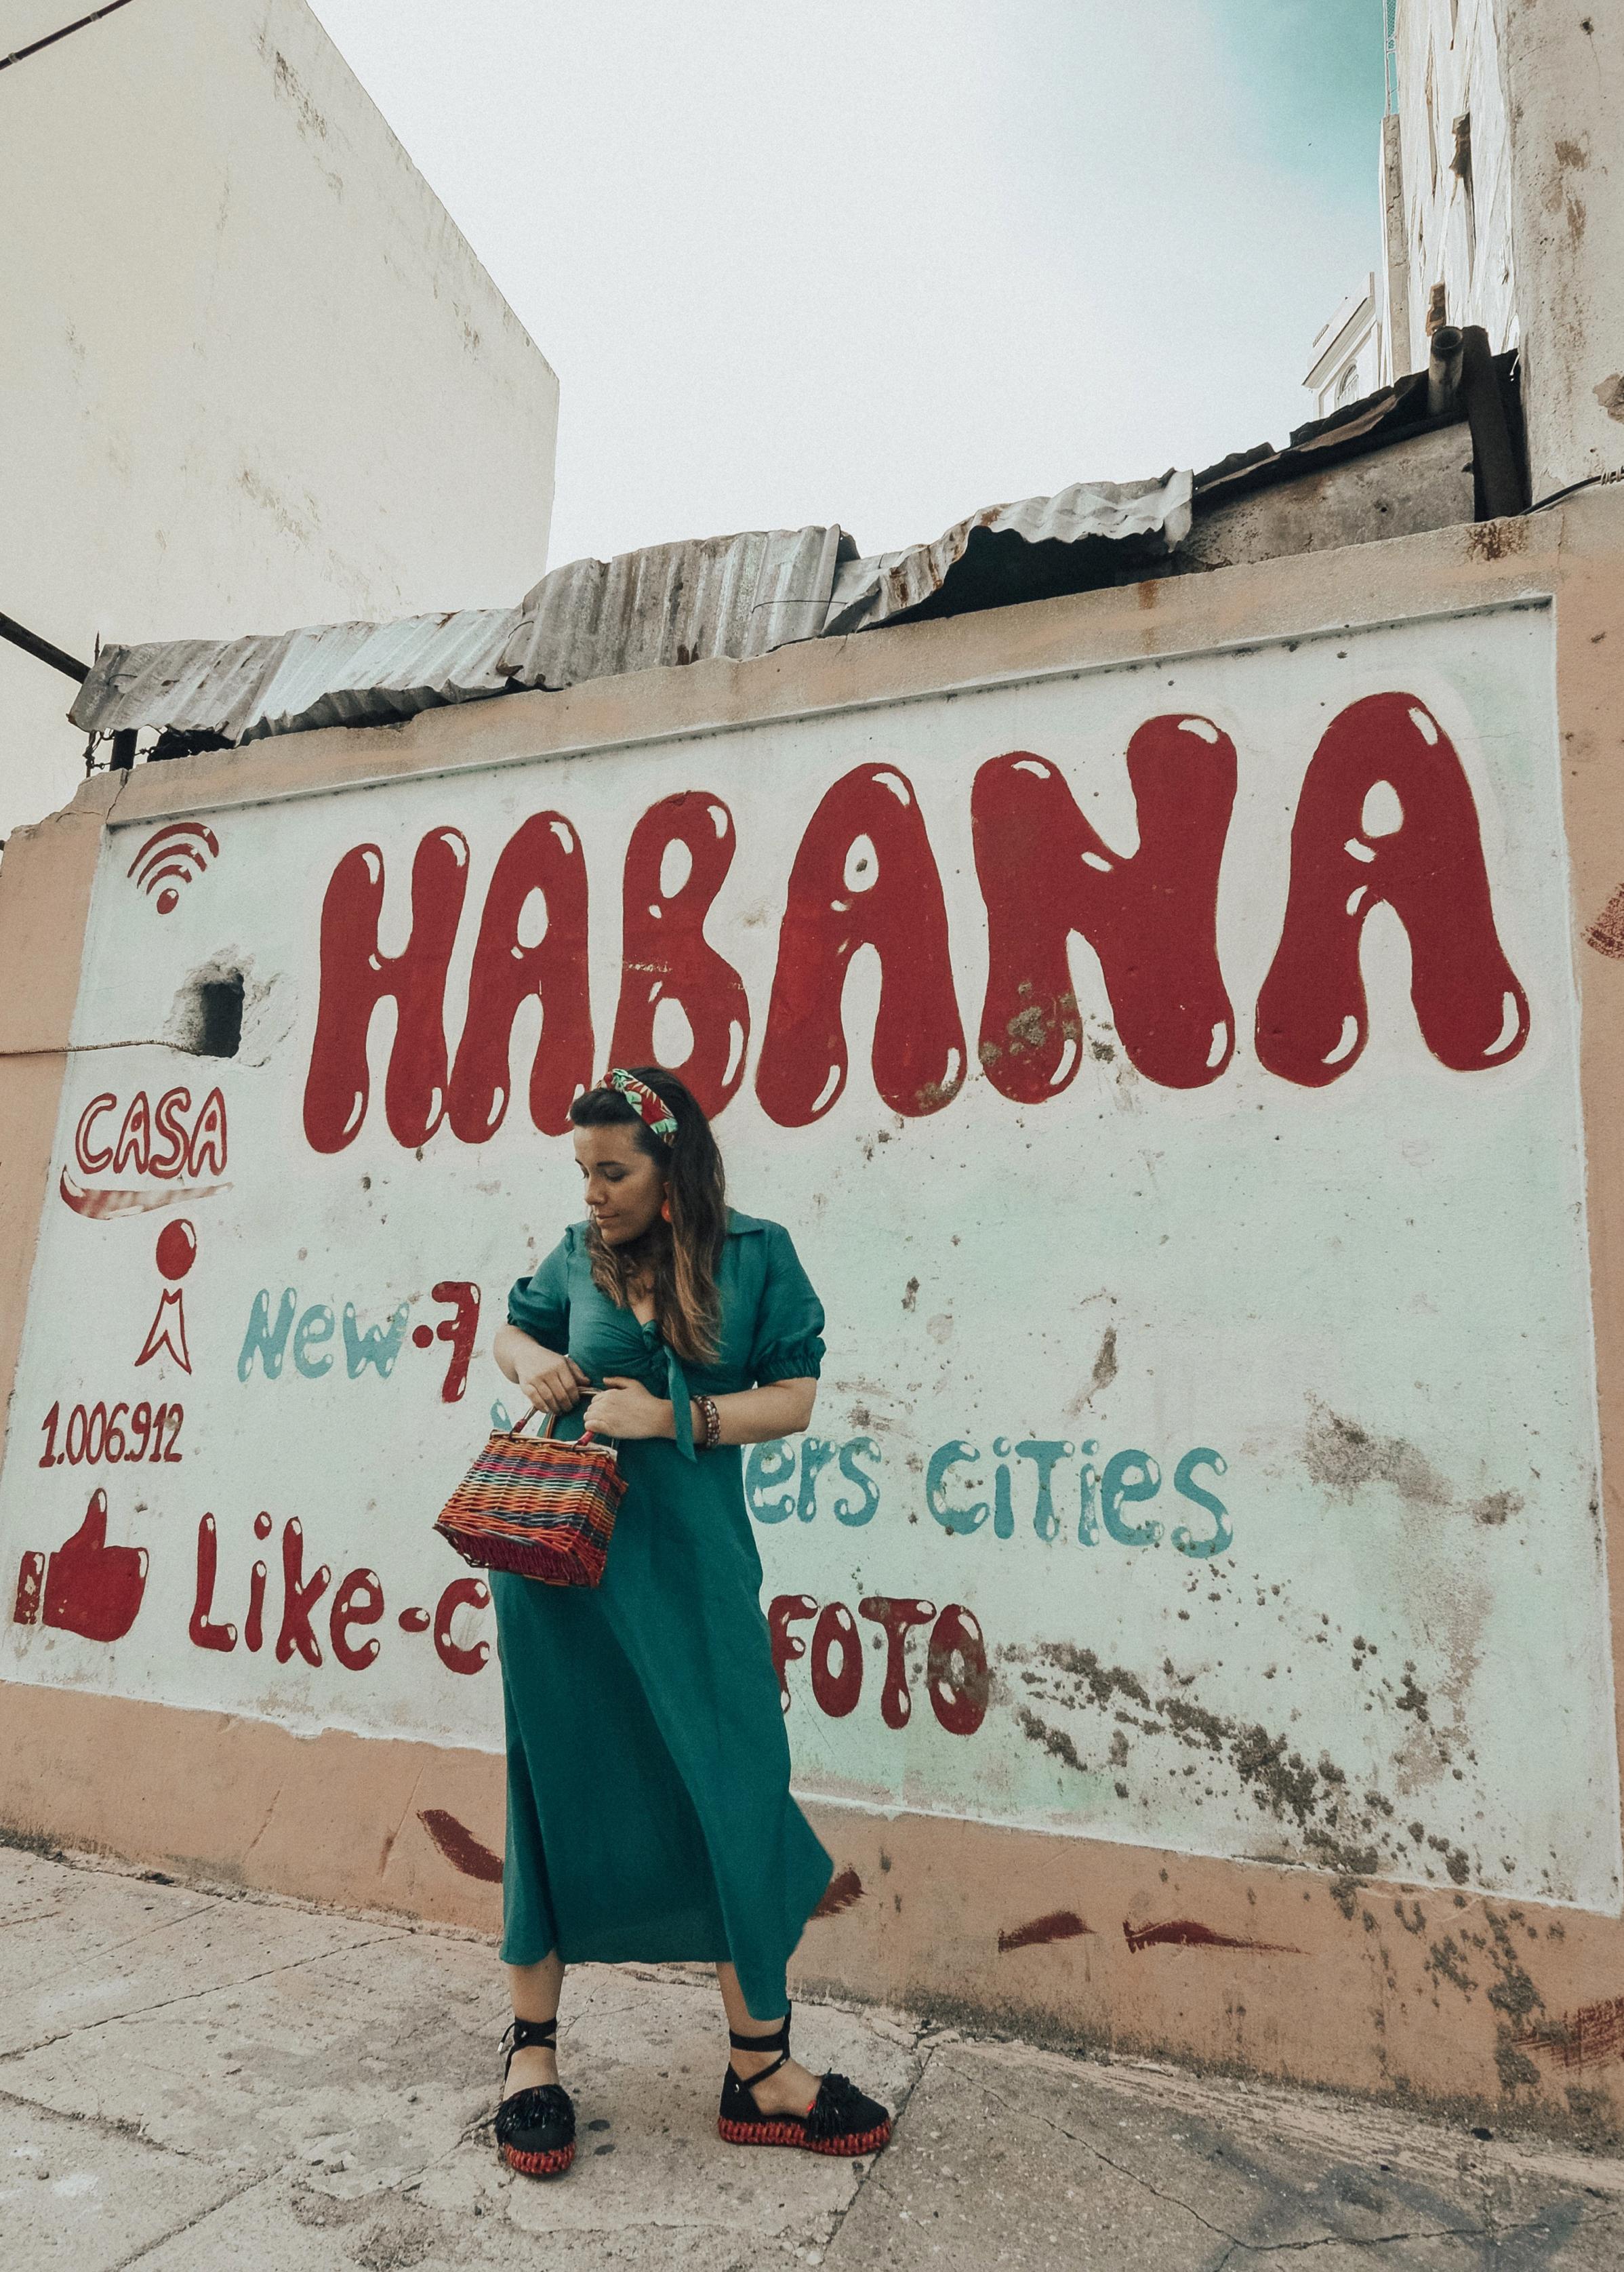 la habana-outfit-streetstyle-line-dress-zara-look